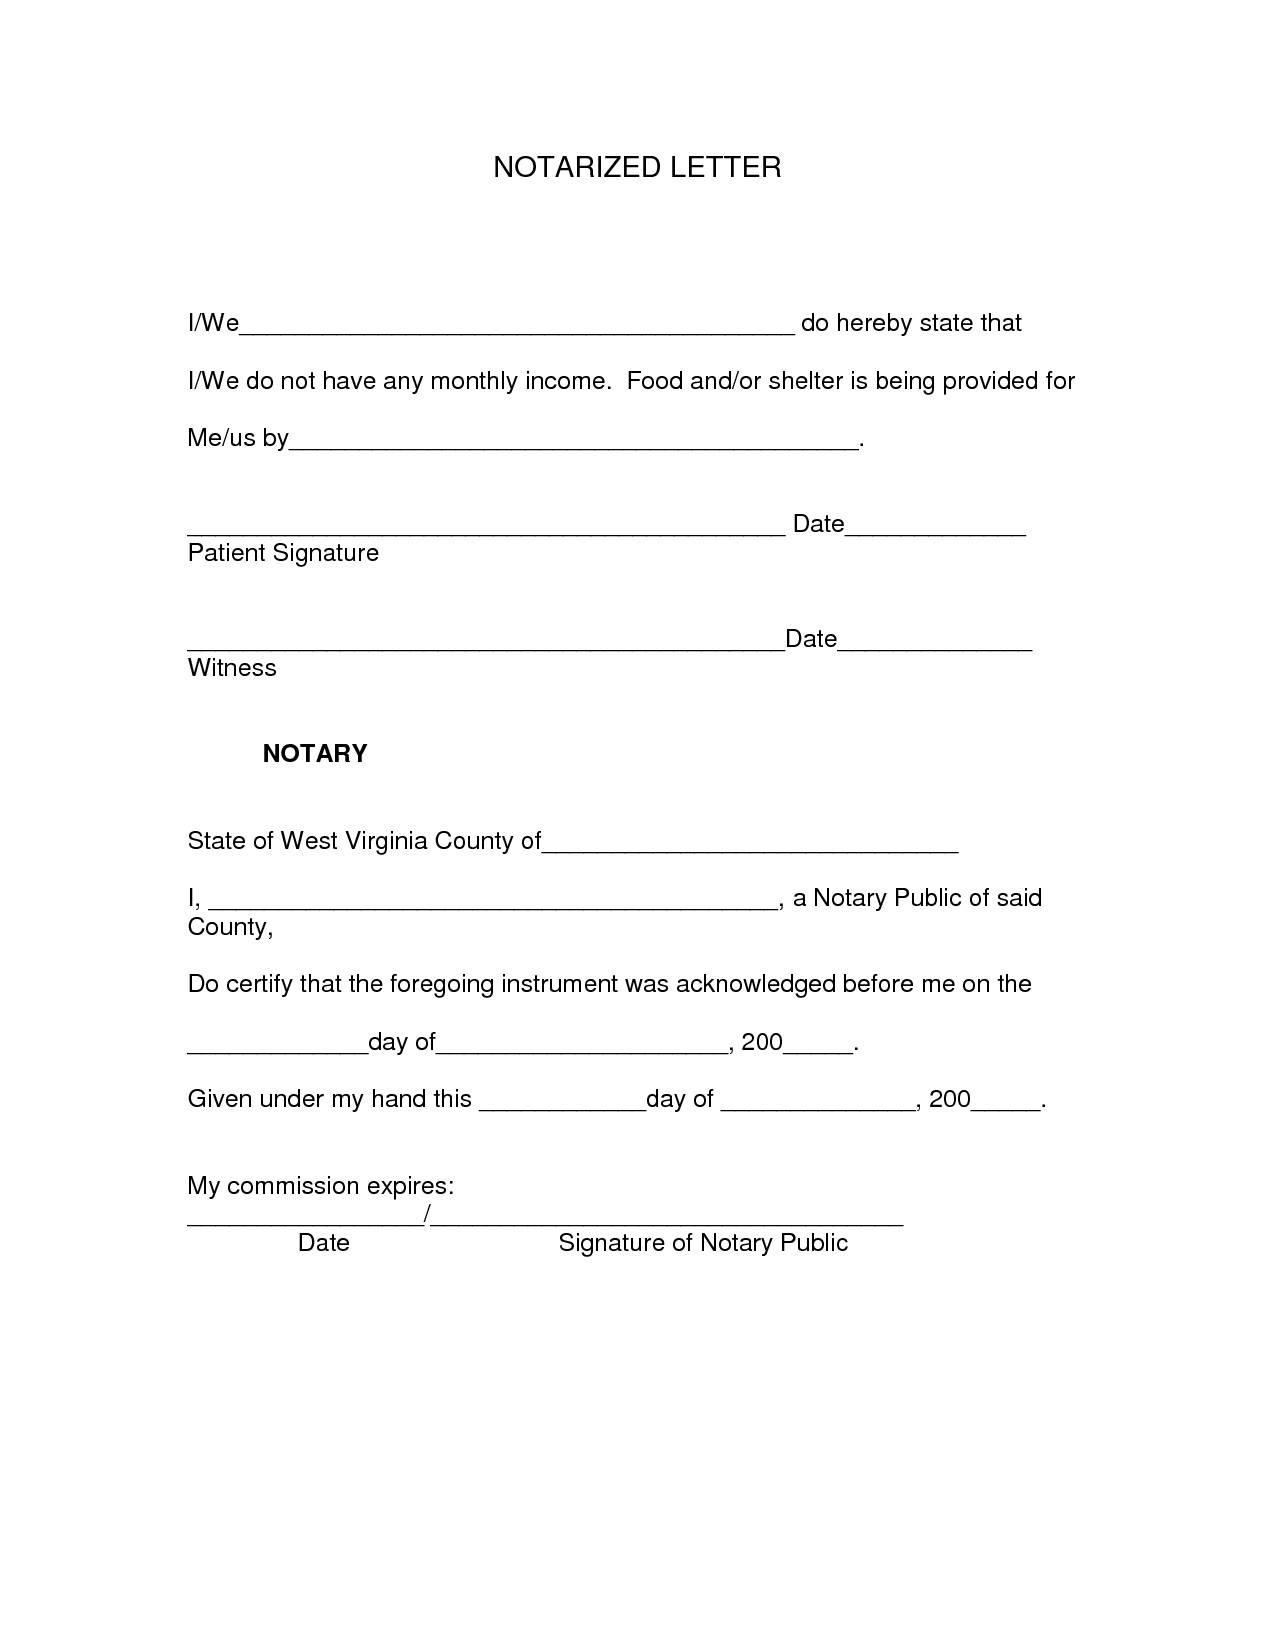 Notary Public Template Florida